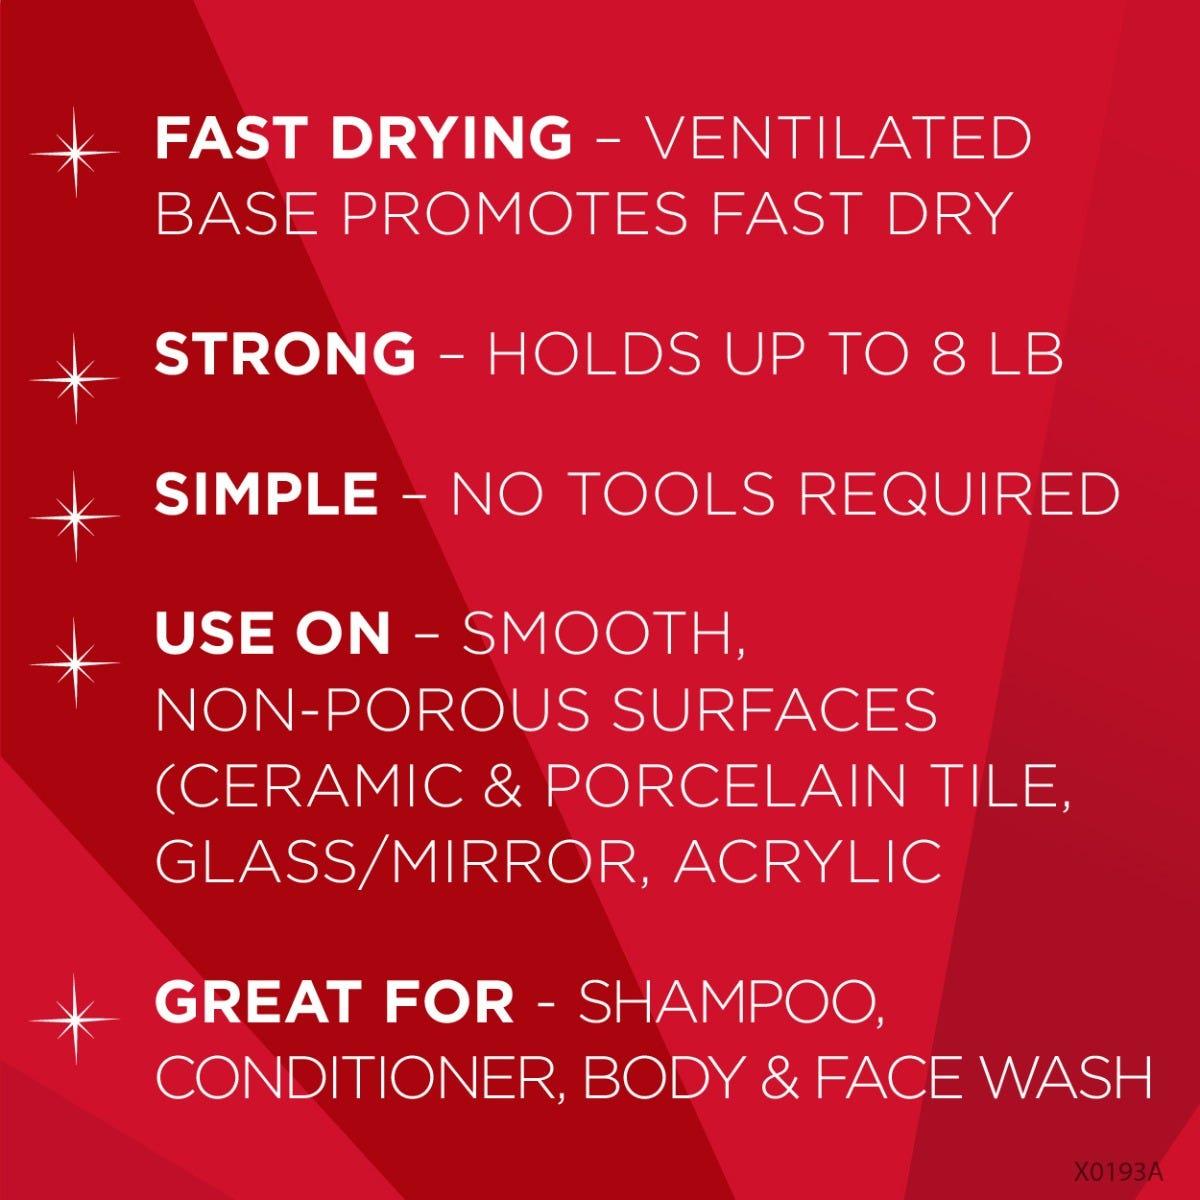 Magic Shower basket benefits